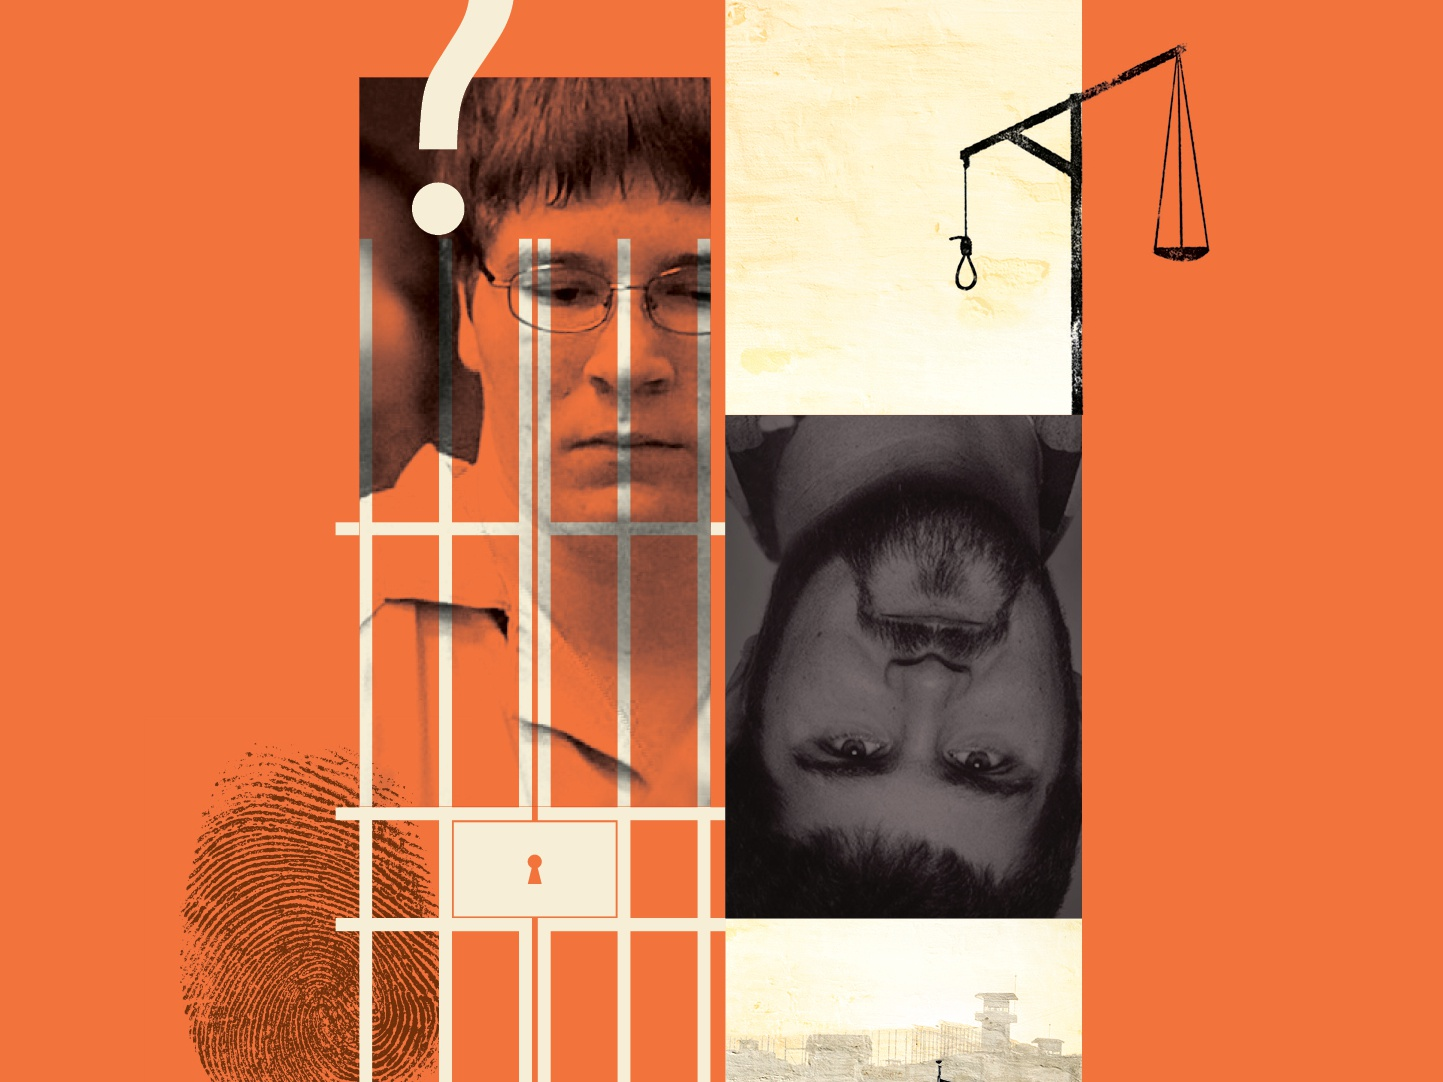 Criminal Controversy prison jail punishment capital penalty death controversy criminal crime